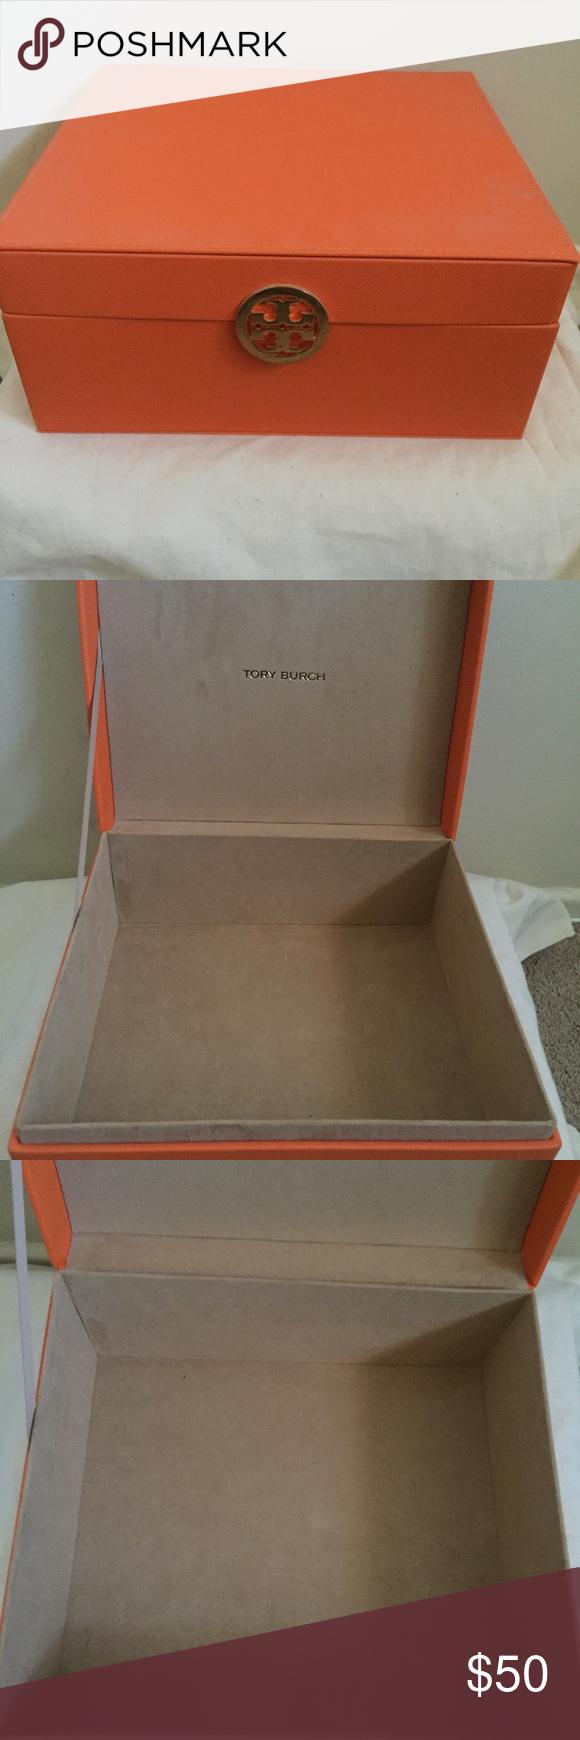 SOLD Tory Burch Makeup Cosmetic Storage Jewelry Bx Jewelry box